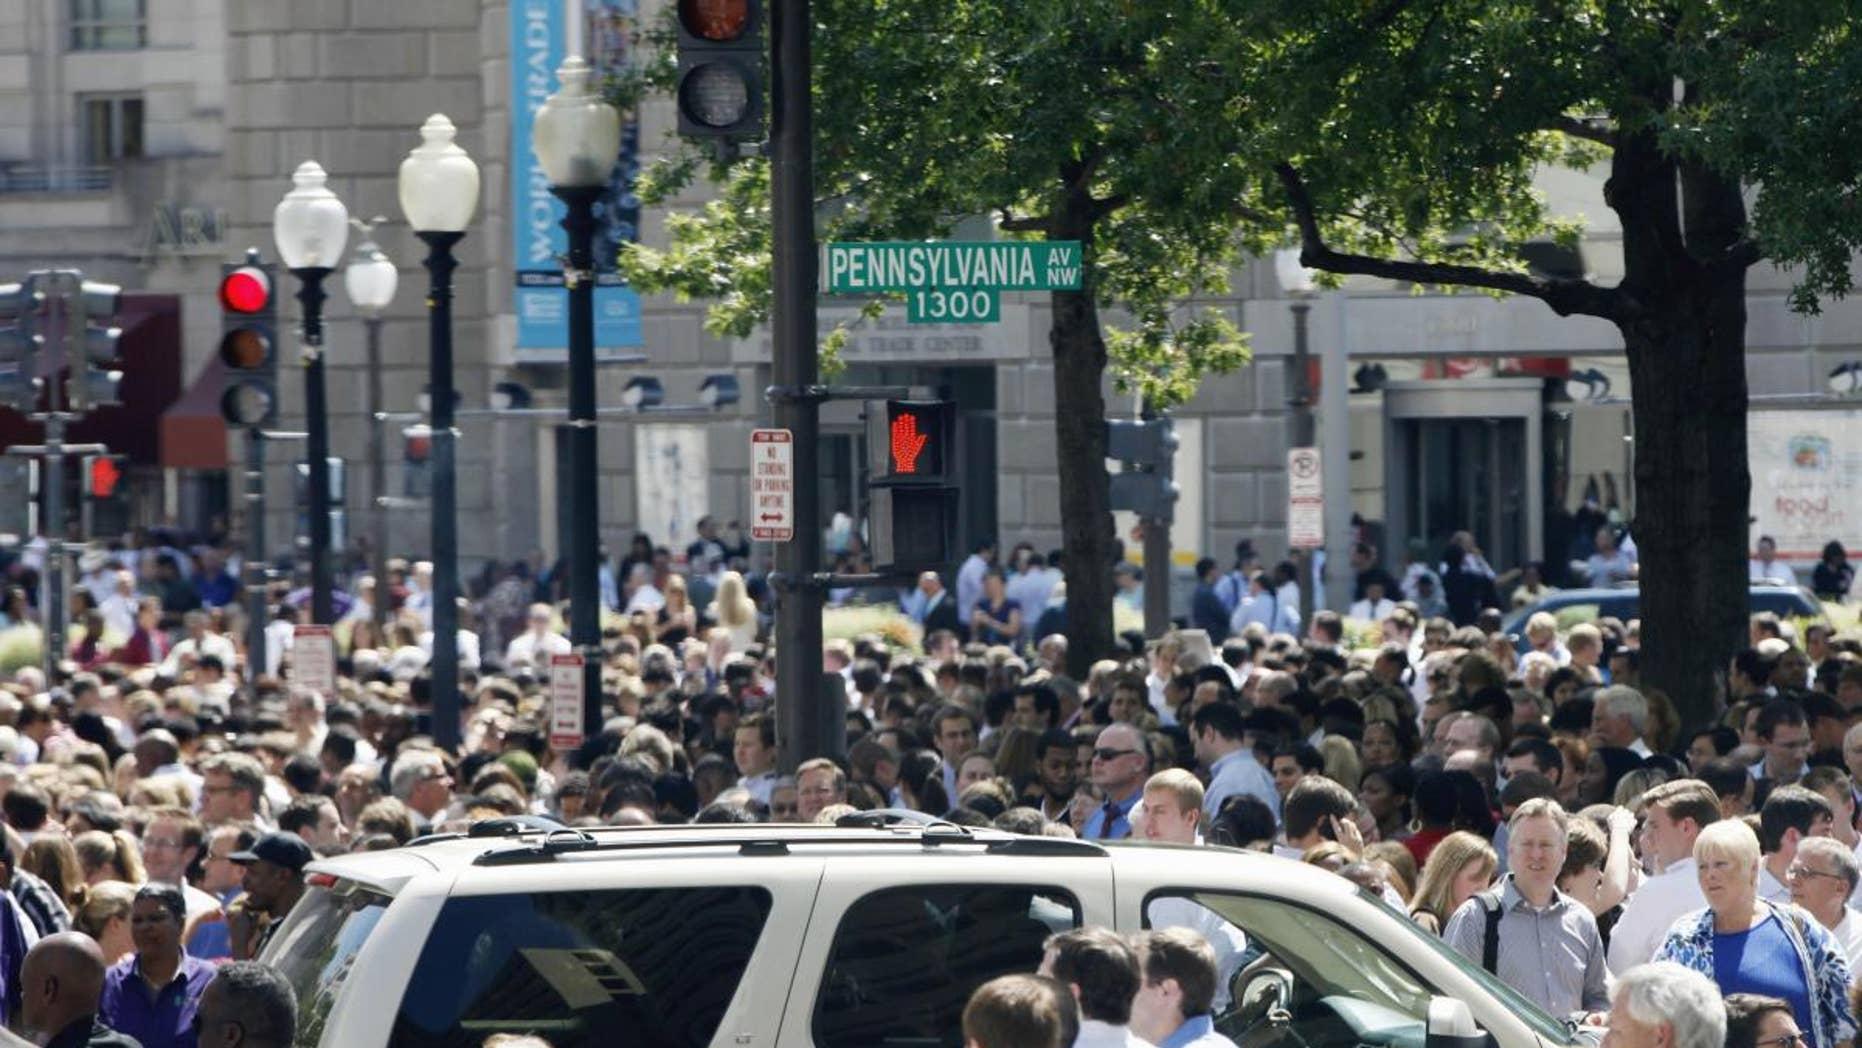 People crowd Pennsylvania Avenue in Washington, Tuesday, Aug. 23, 2011, as buildings were evacuated following an earthquake. (AP Photo/Charles Dharapak)